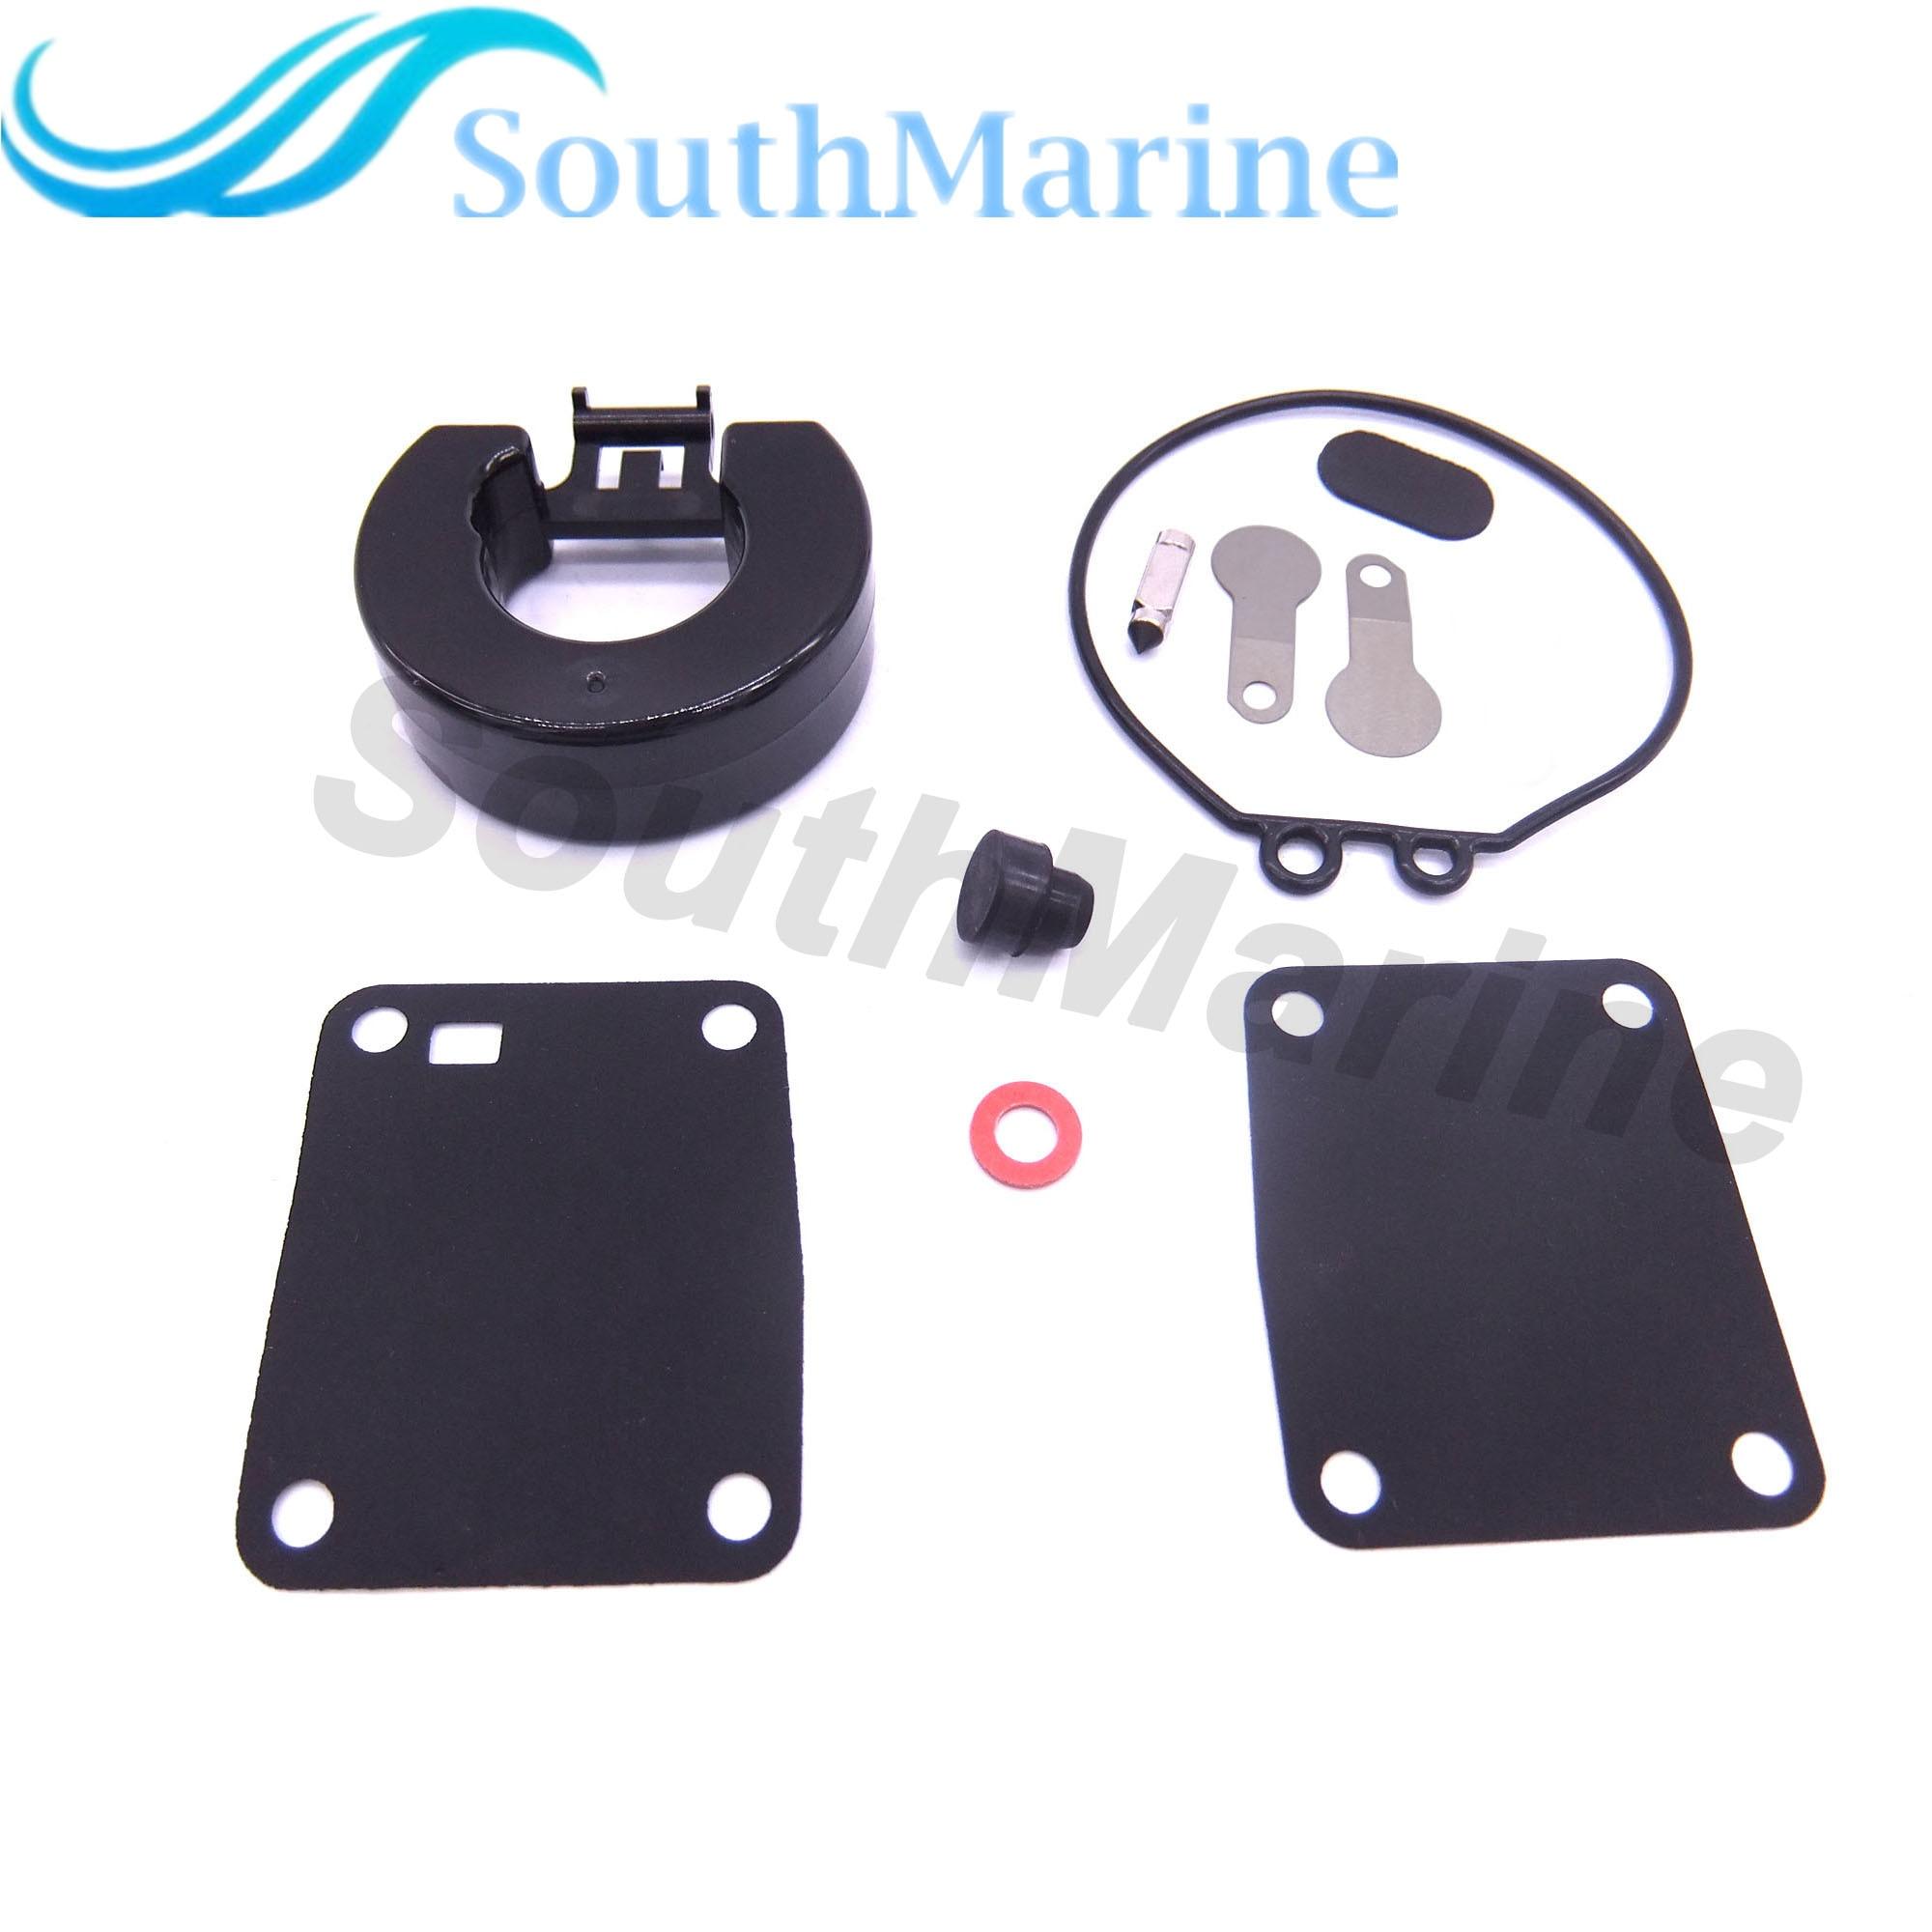 Boat Engine Carburetor Repair Kit For Yamaha 3HP 6HP 8HP Outboard Engine 6G1-W0093-00-00 18-7765